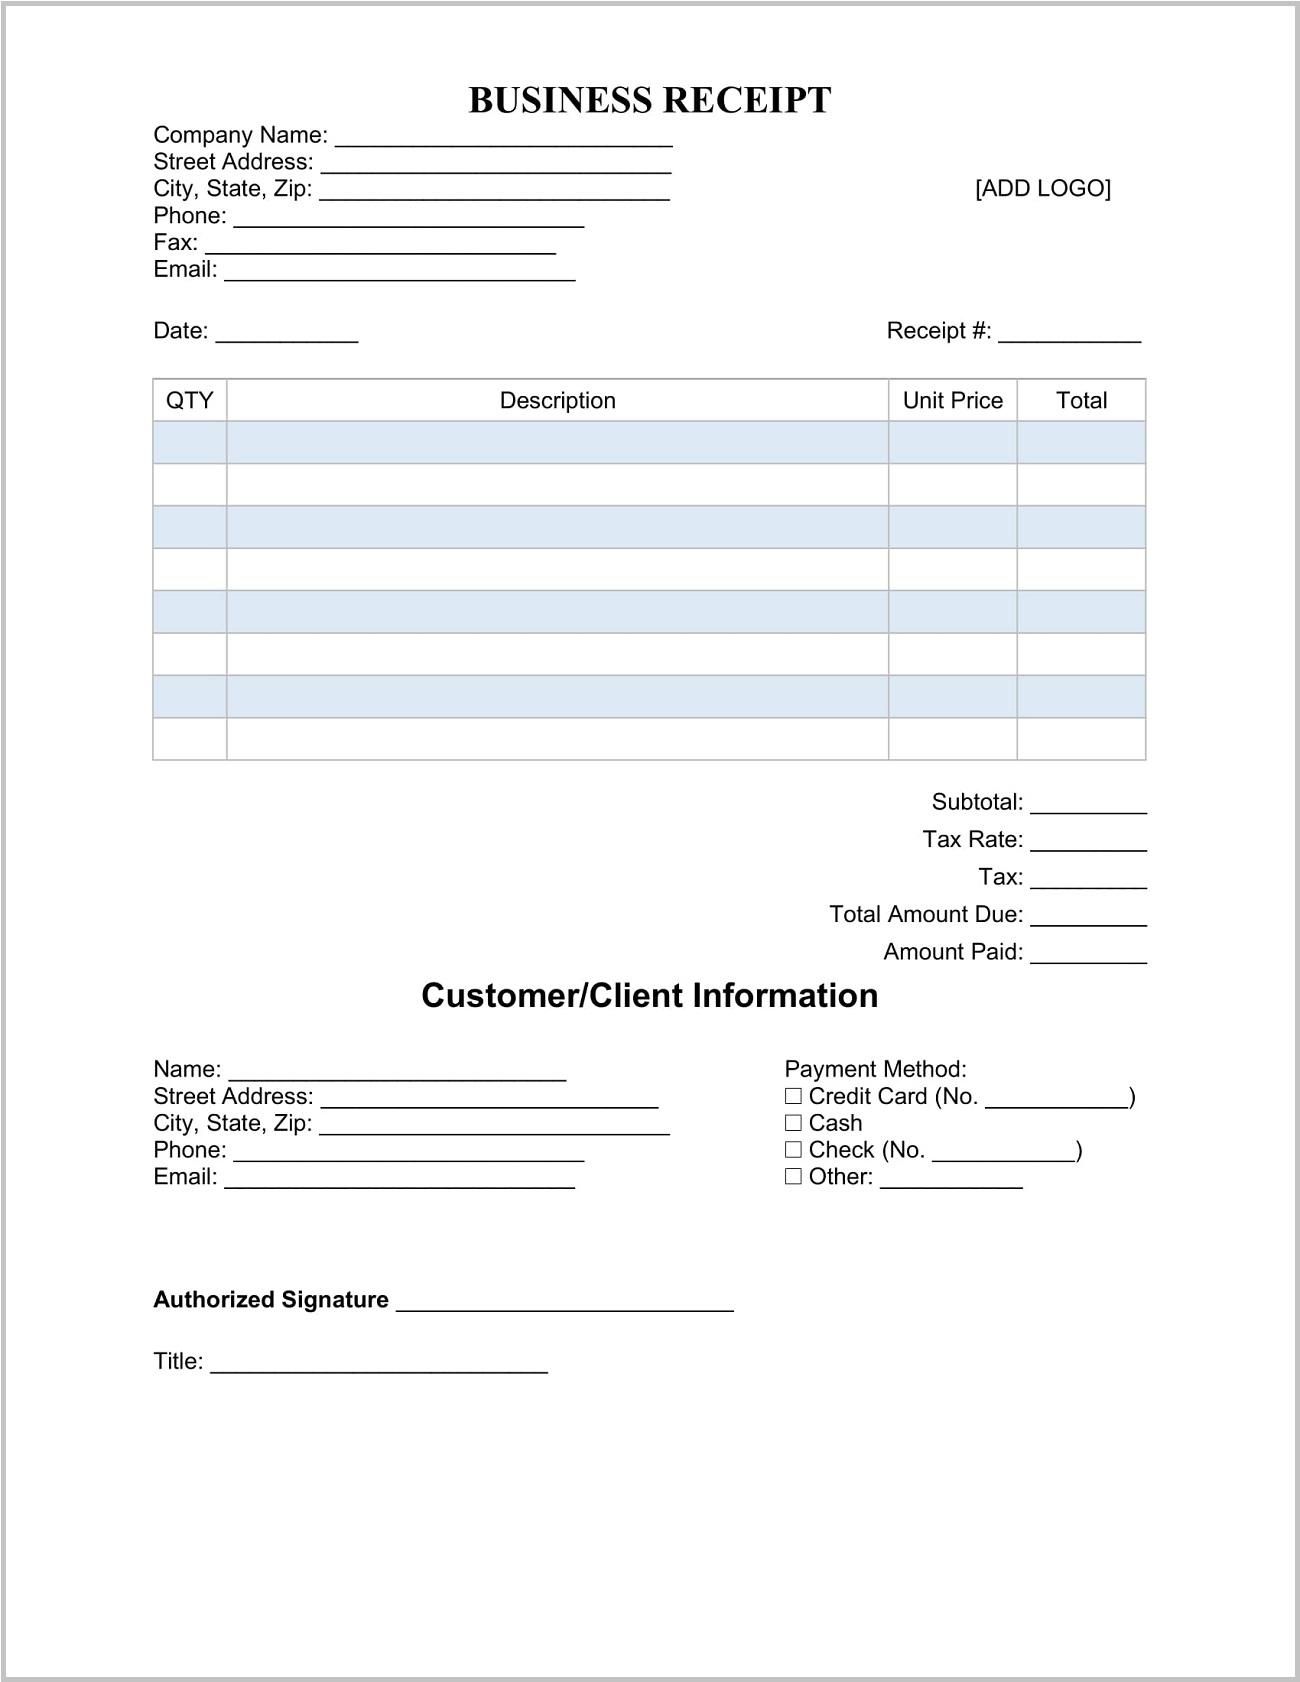 Business Receipt Template Sample